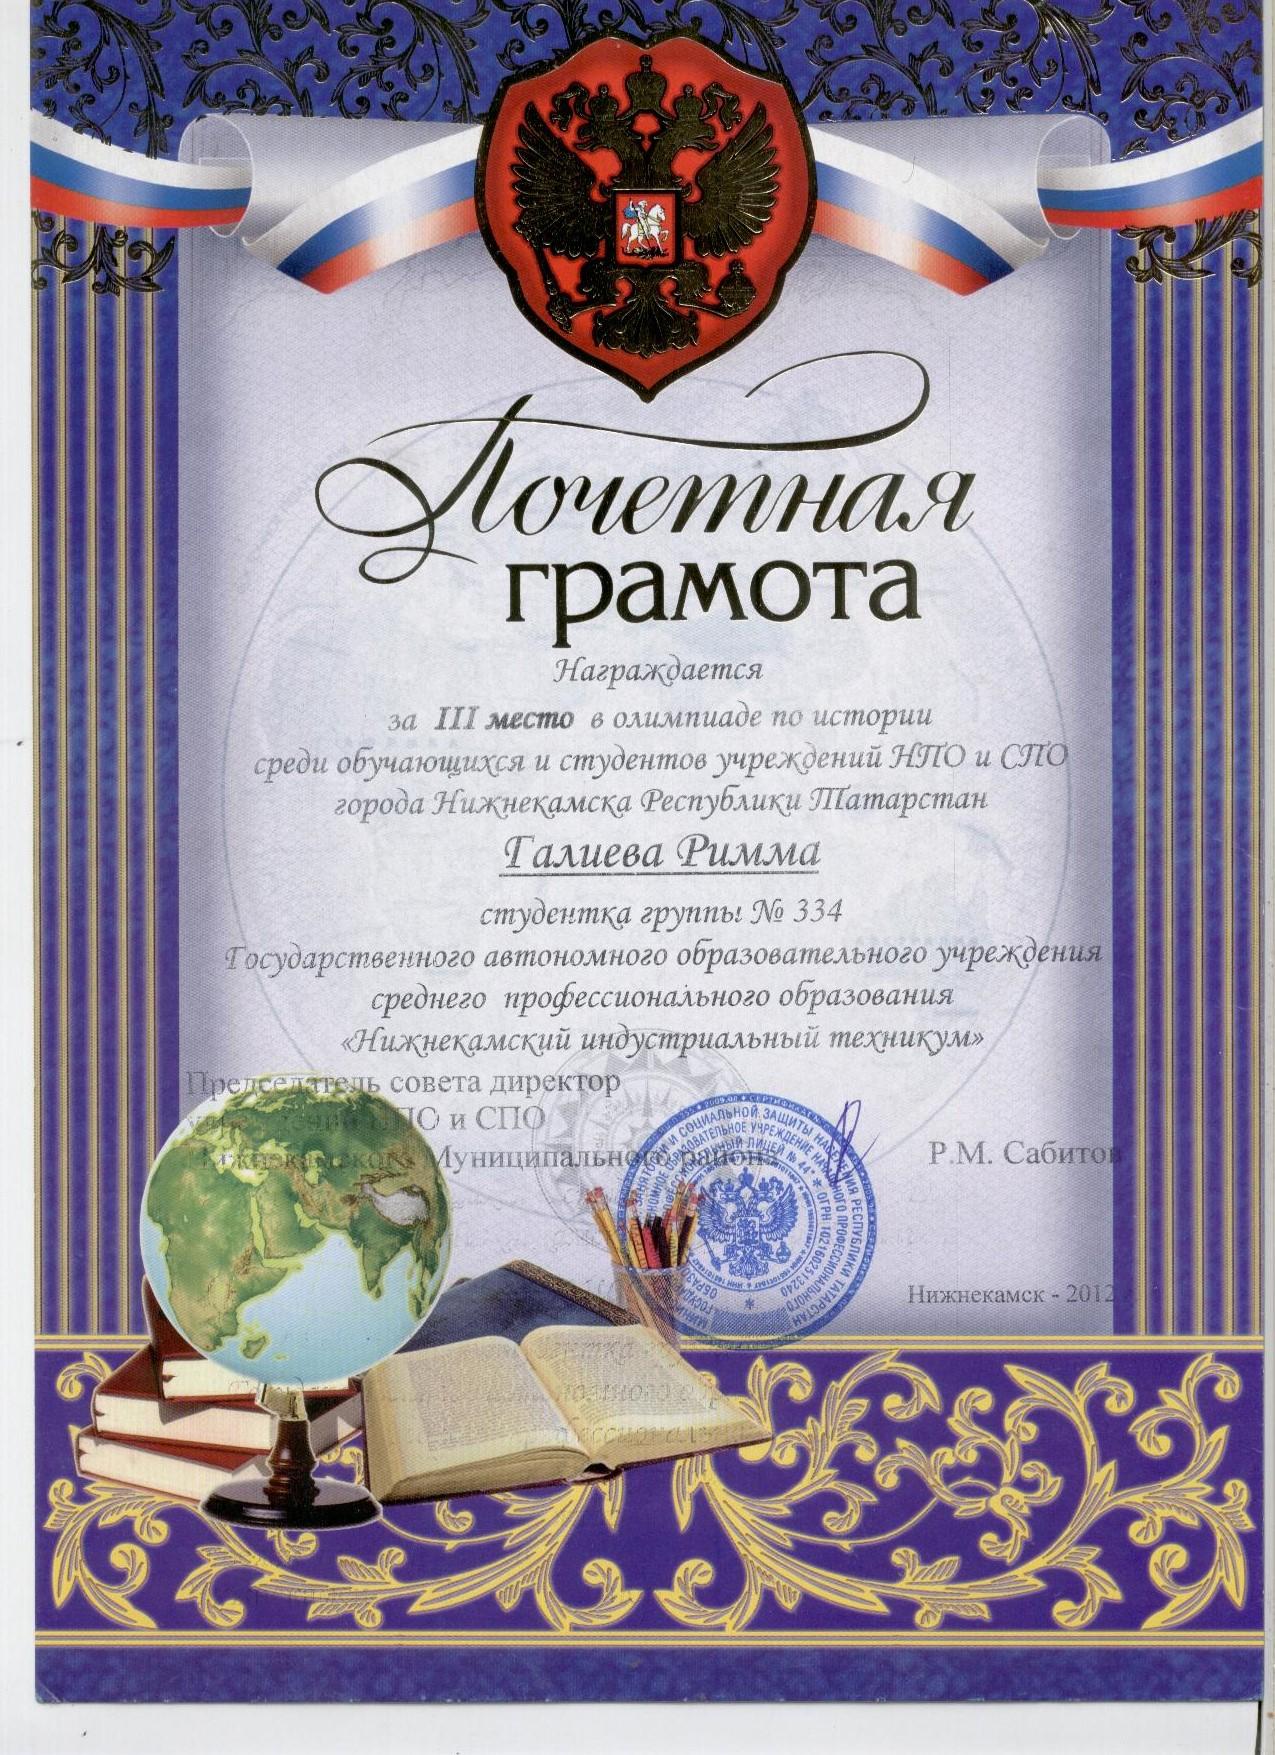 F:\Всероссйский конкурс Портфолио выпускника\РИММА\Римма 028.jpg